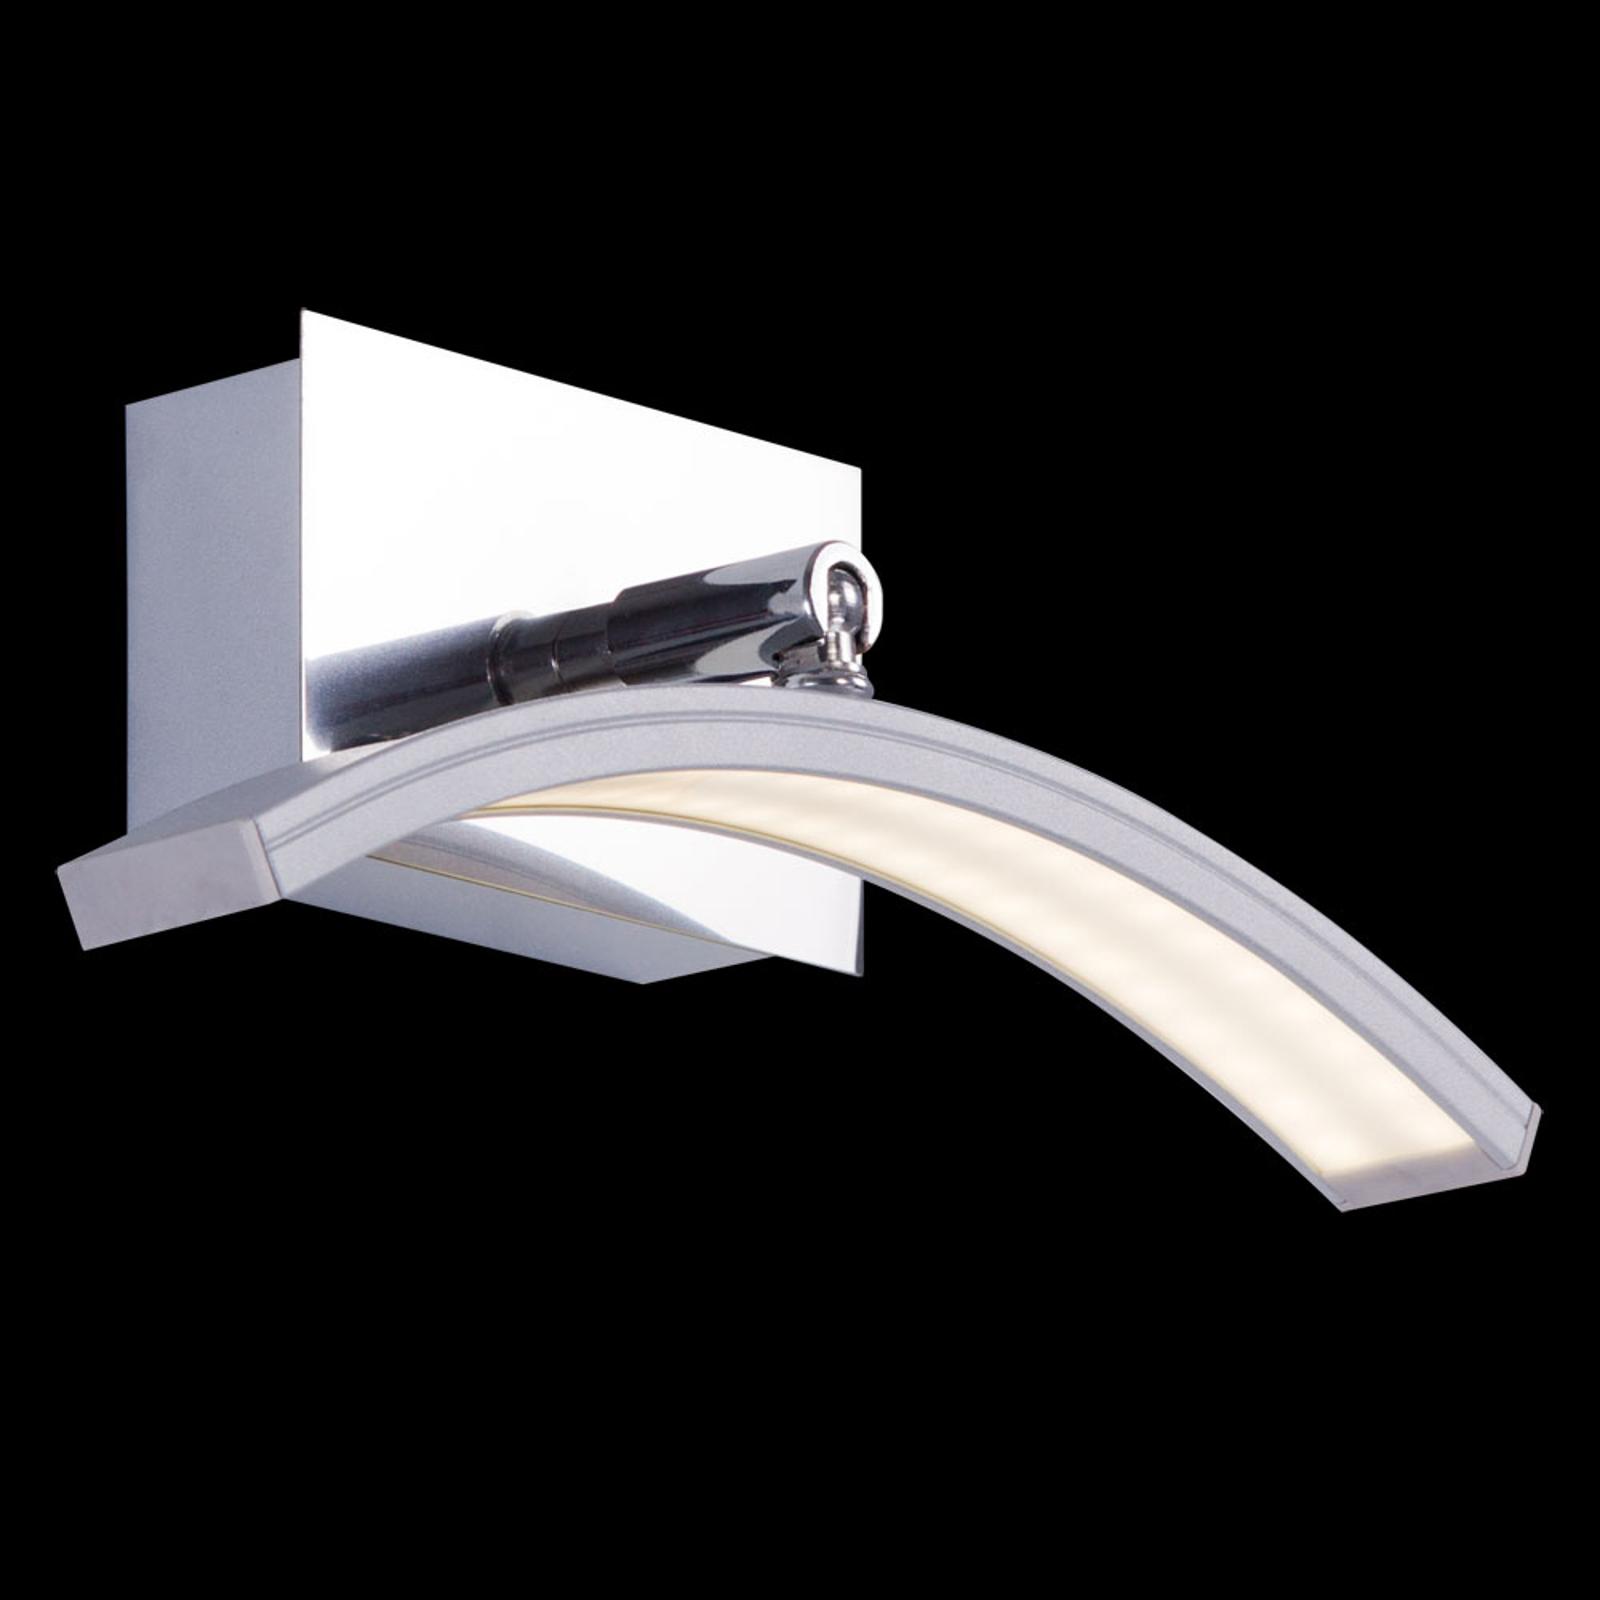 Applique LED arquée Largo, finition en aluminium